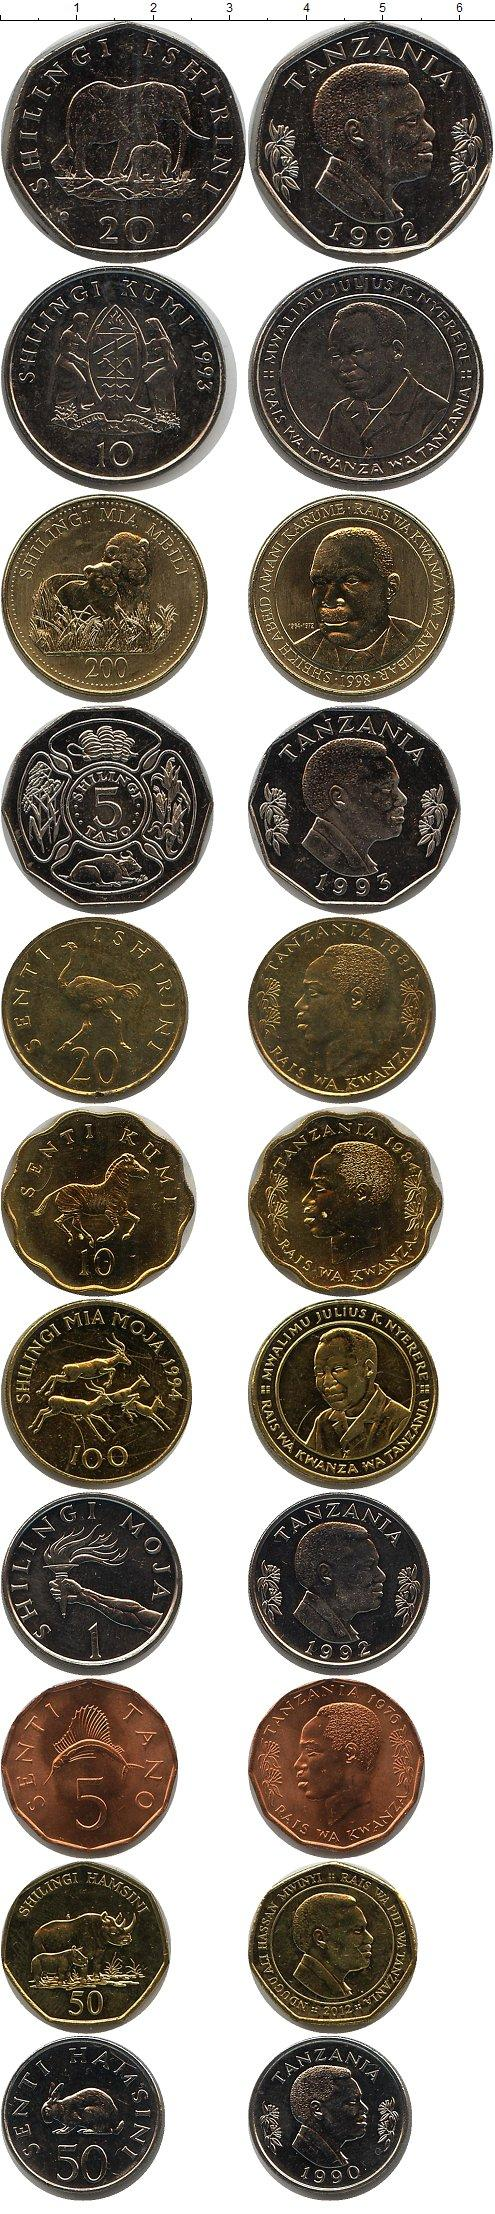 Каталог монет - Танзания Танзания 1976-2012